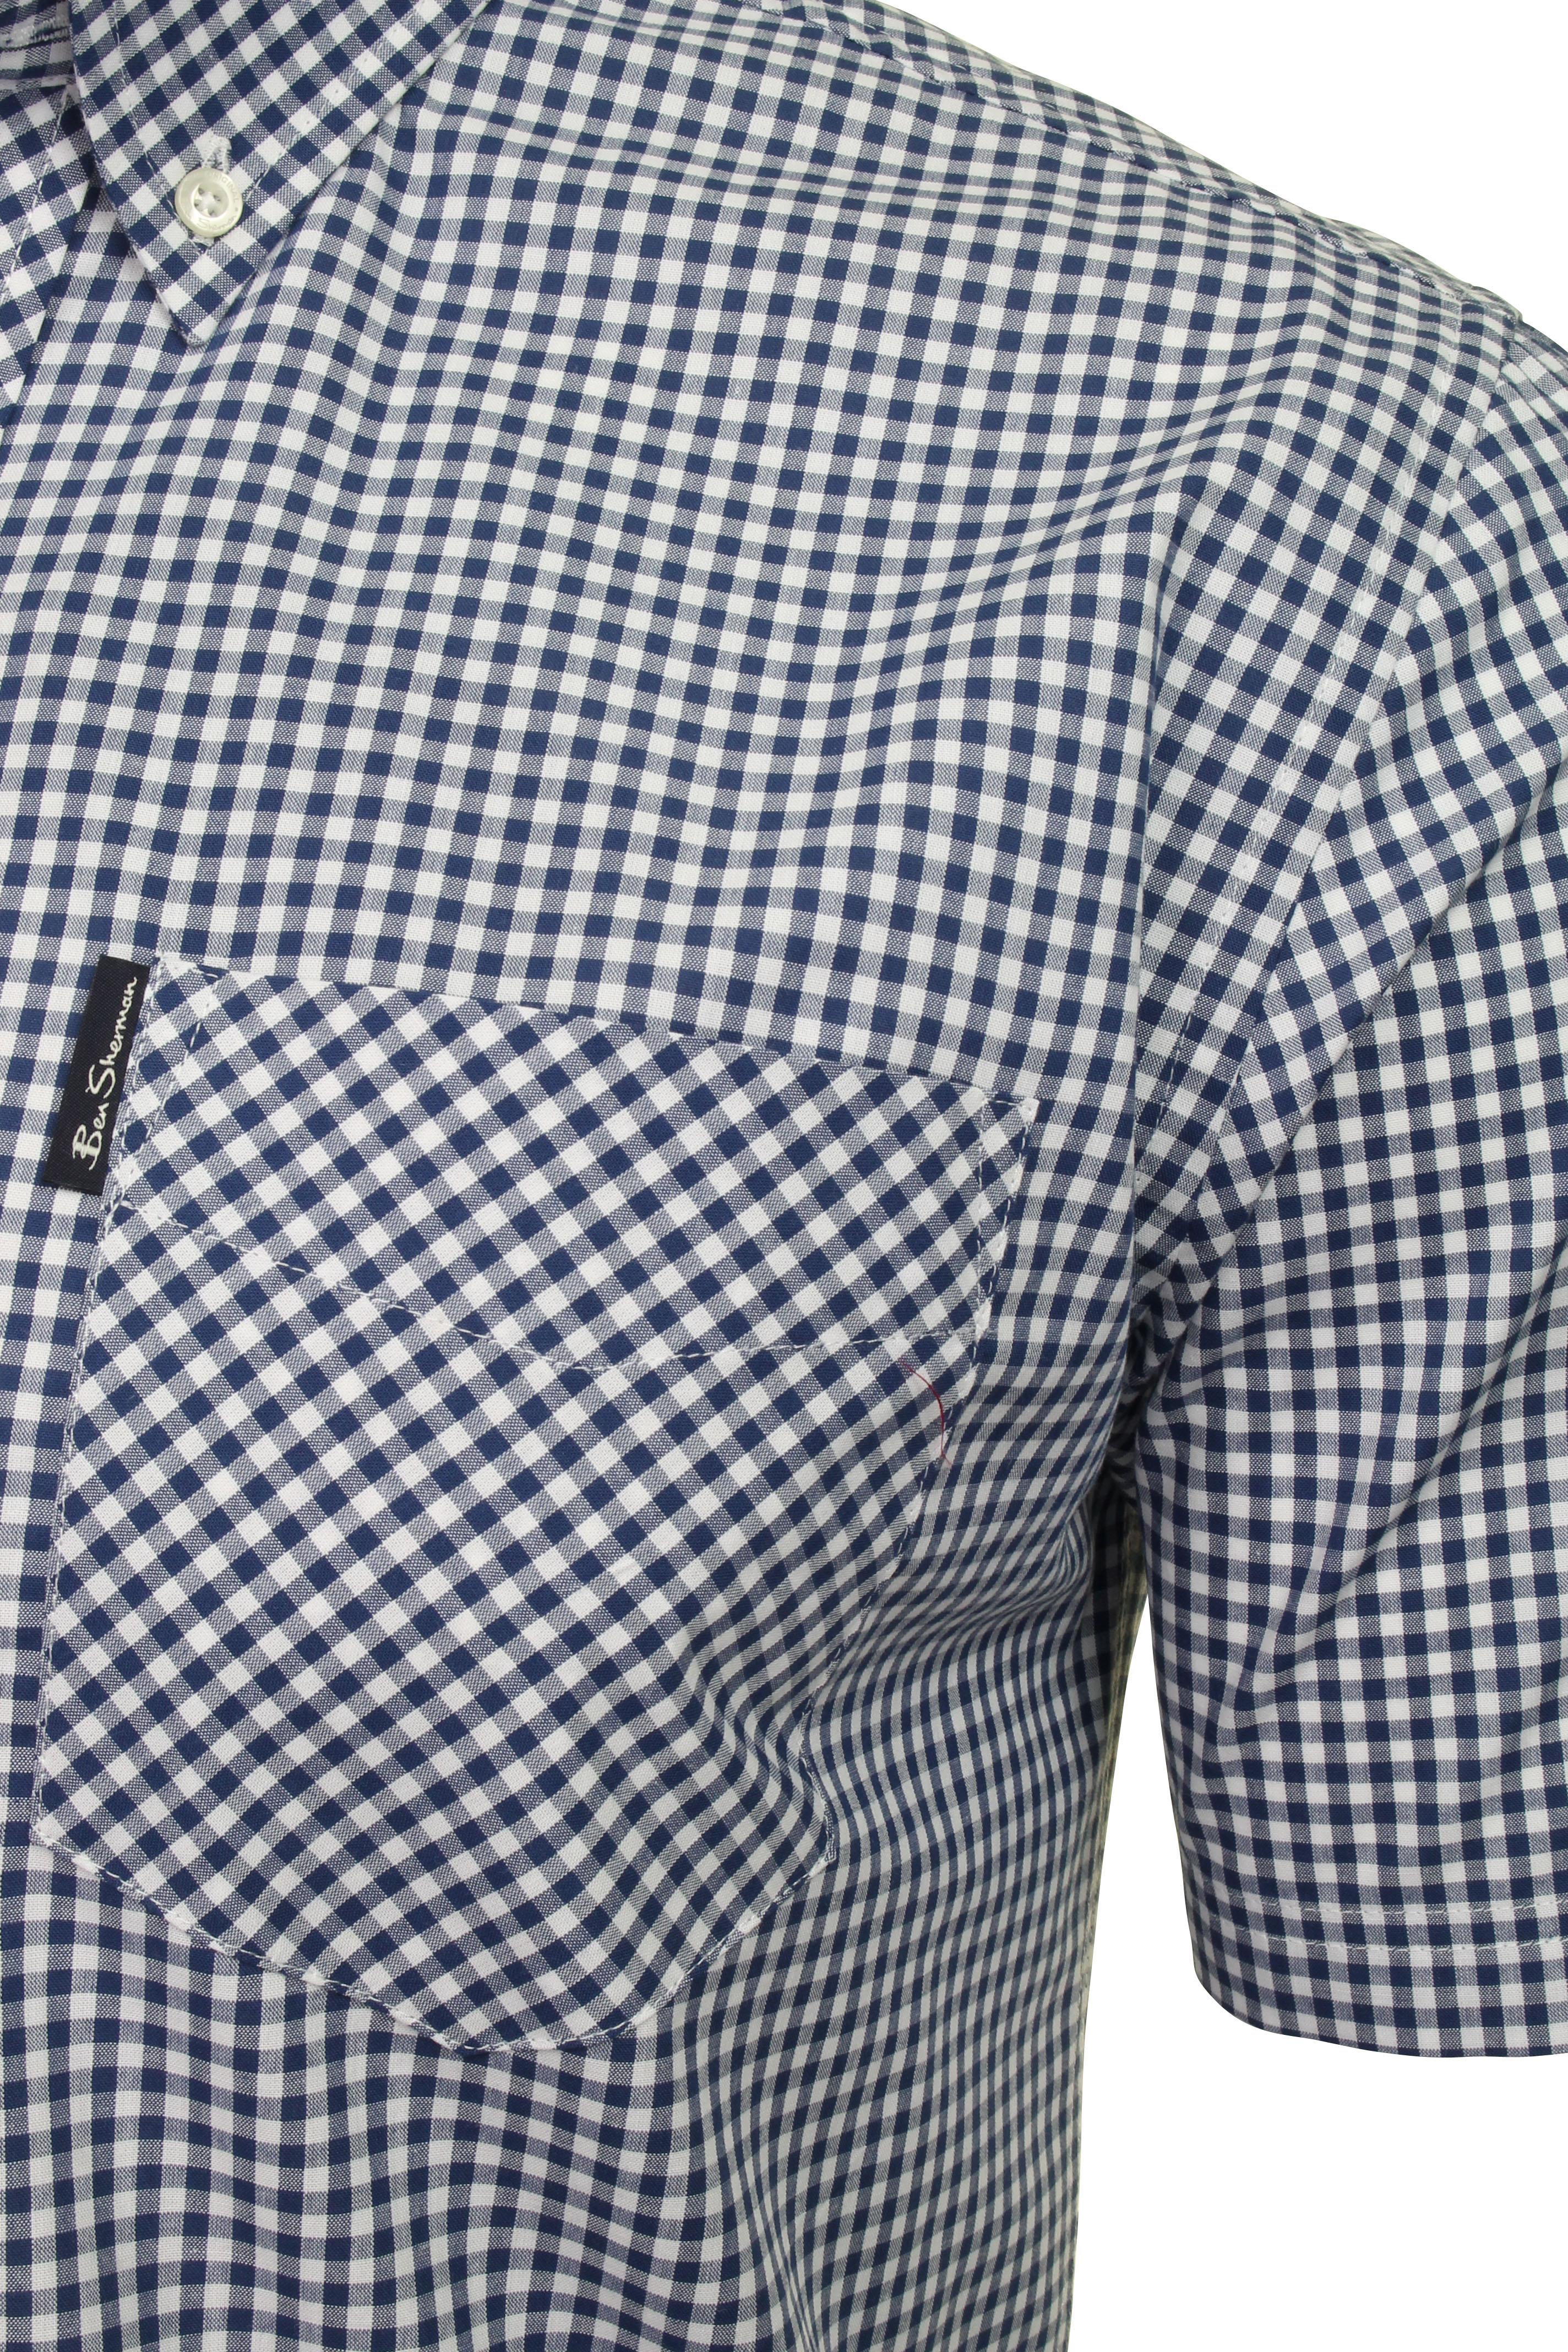 Ben-Sherman-Mens-Short-Sleeved-Gingham-Check-Shirt thumbnail 4